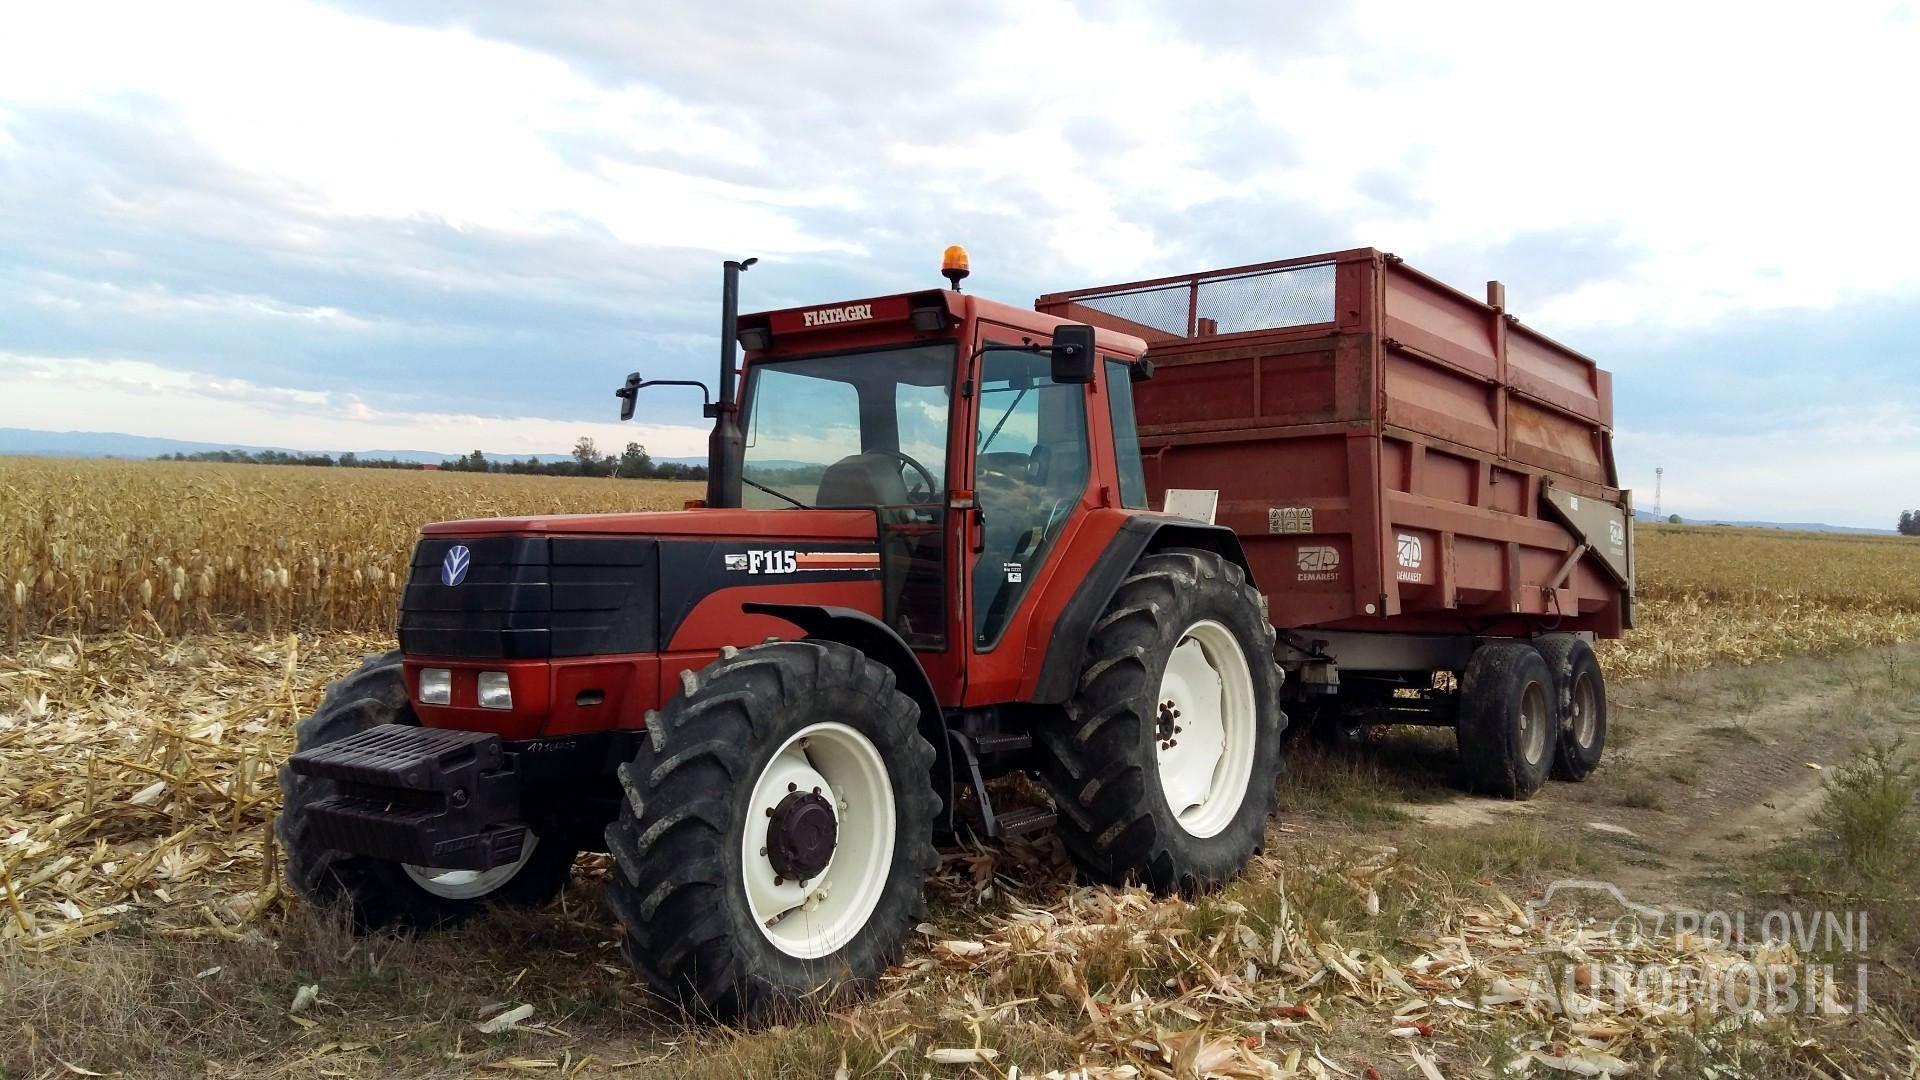 Fiat F115 Fiat, Tractors, Tractor Pulling